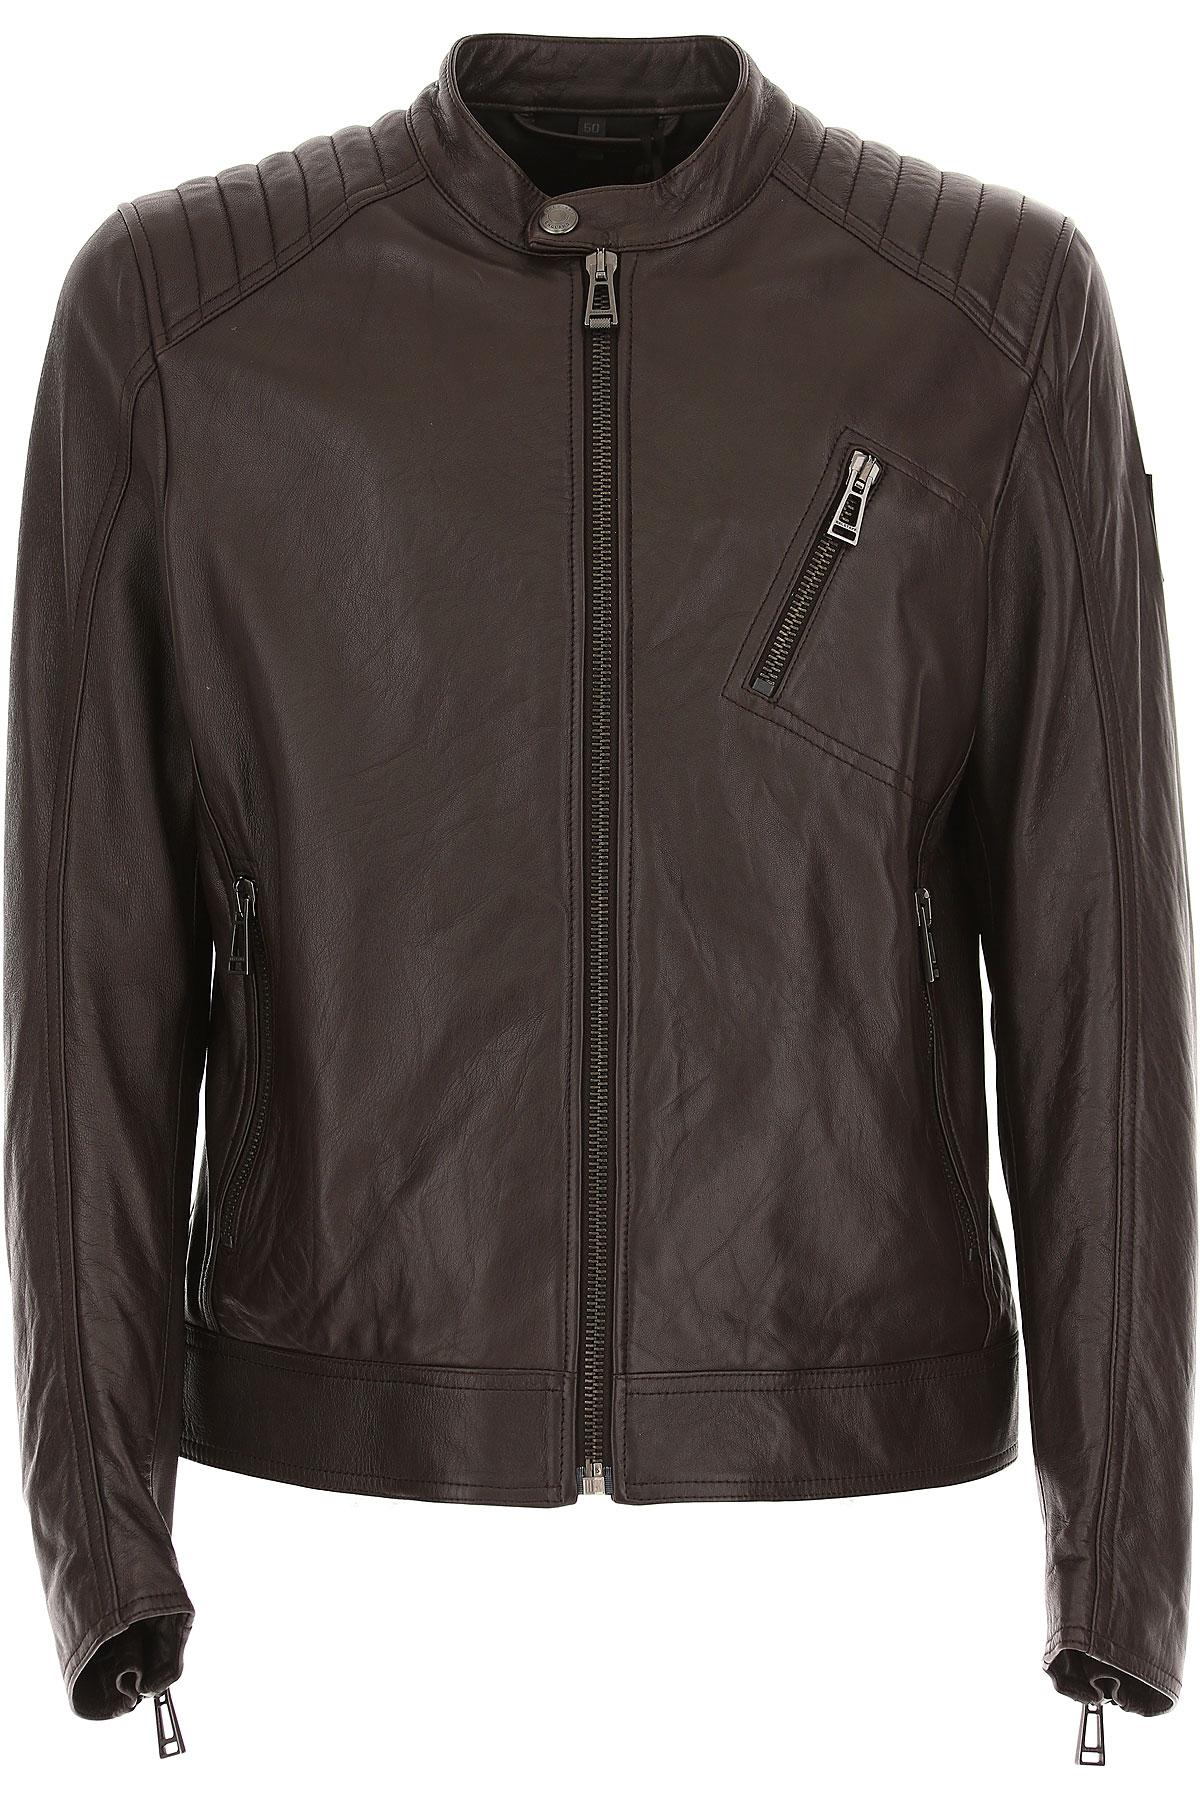 Image of Belstaff Leather Jacket for Men, Dark Brown, Leather, 2017, L M XL